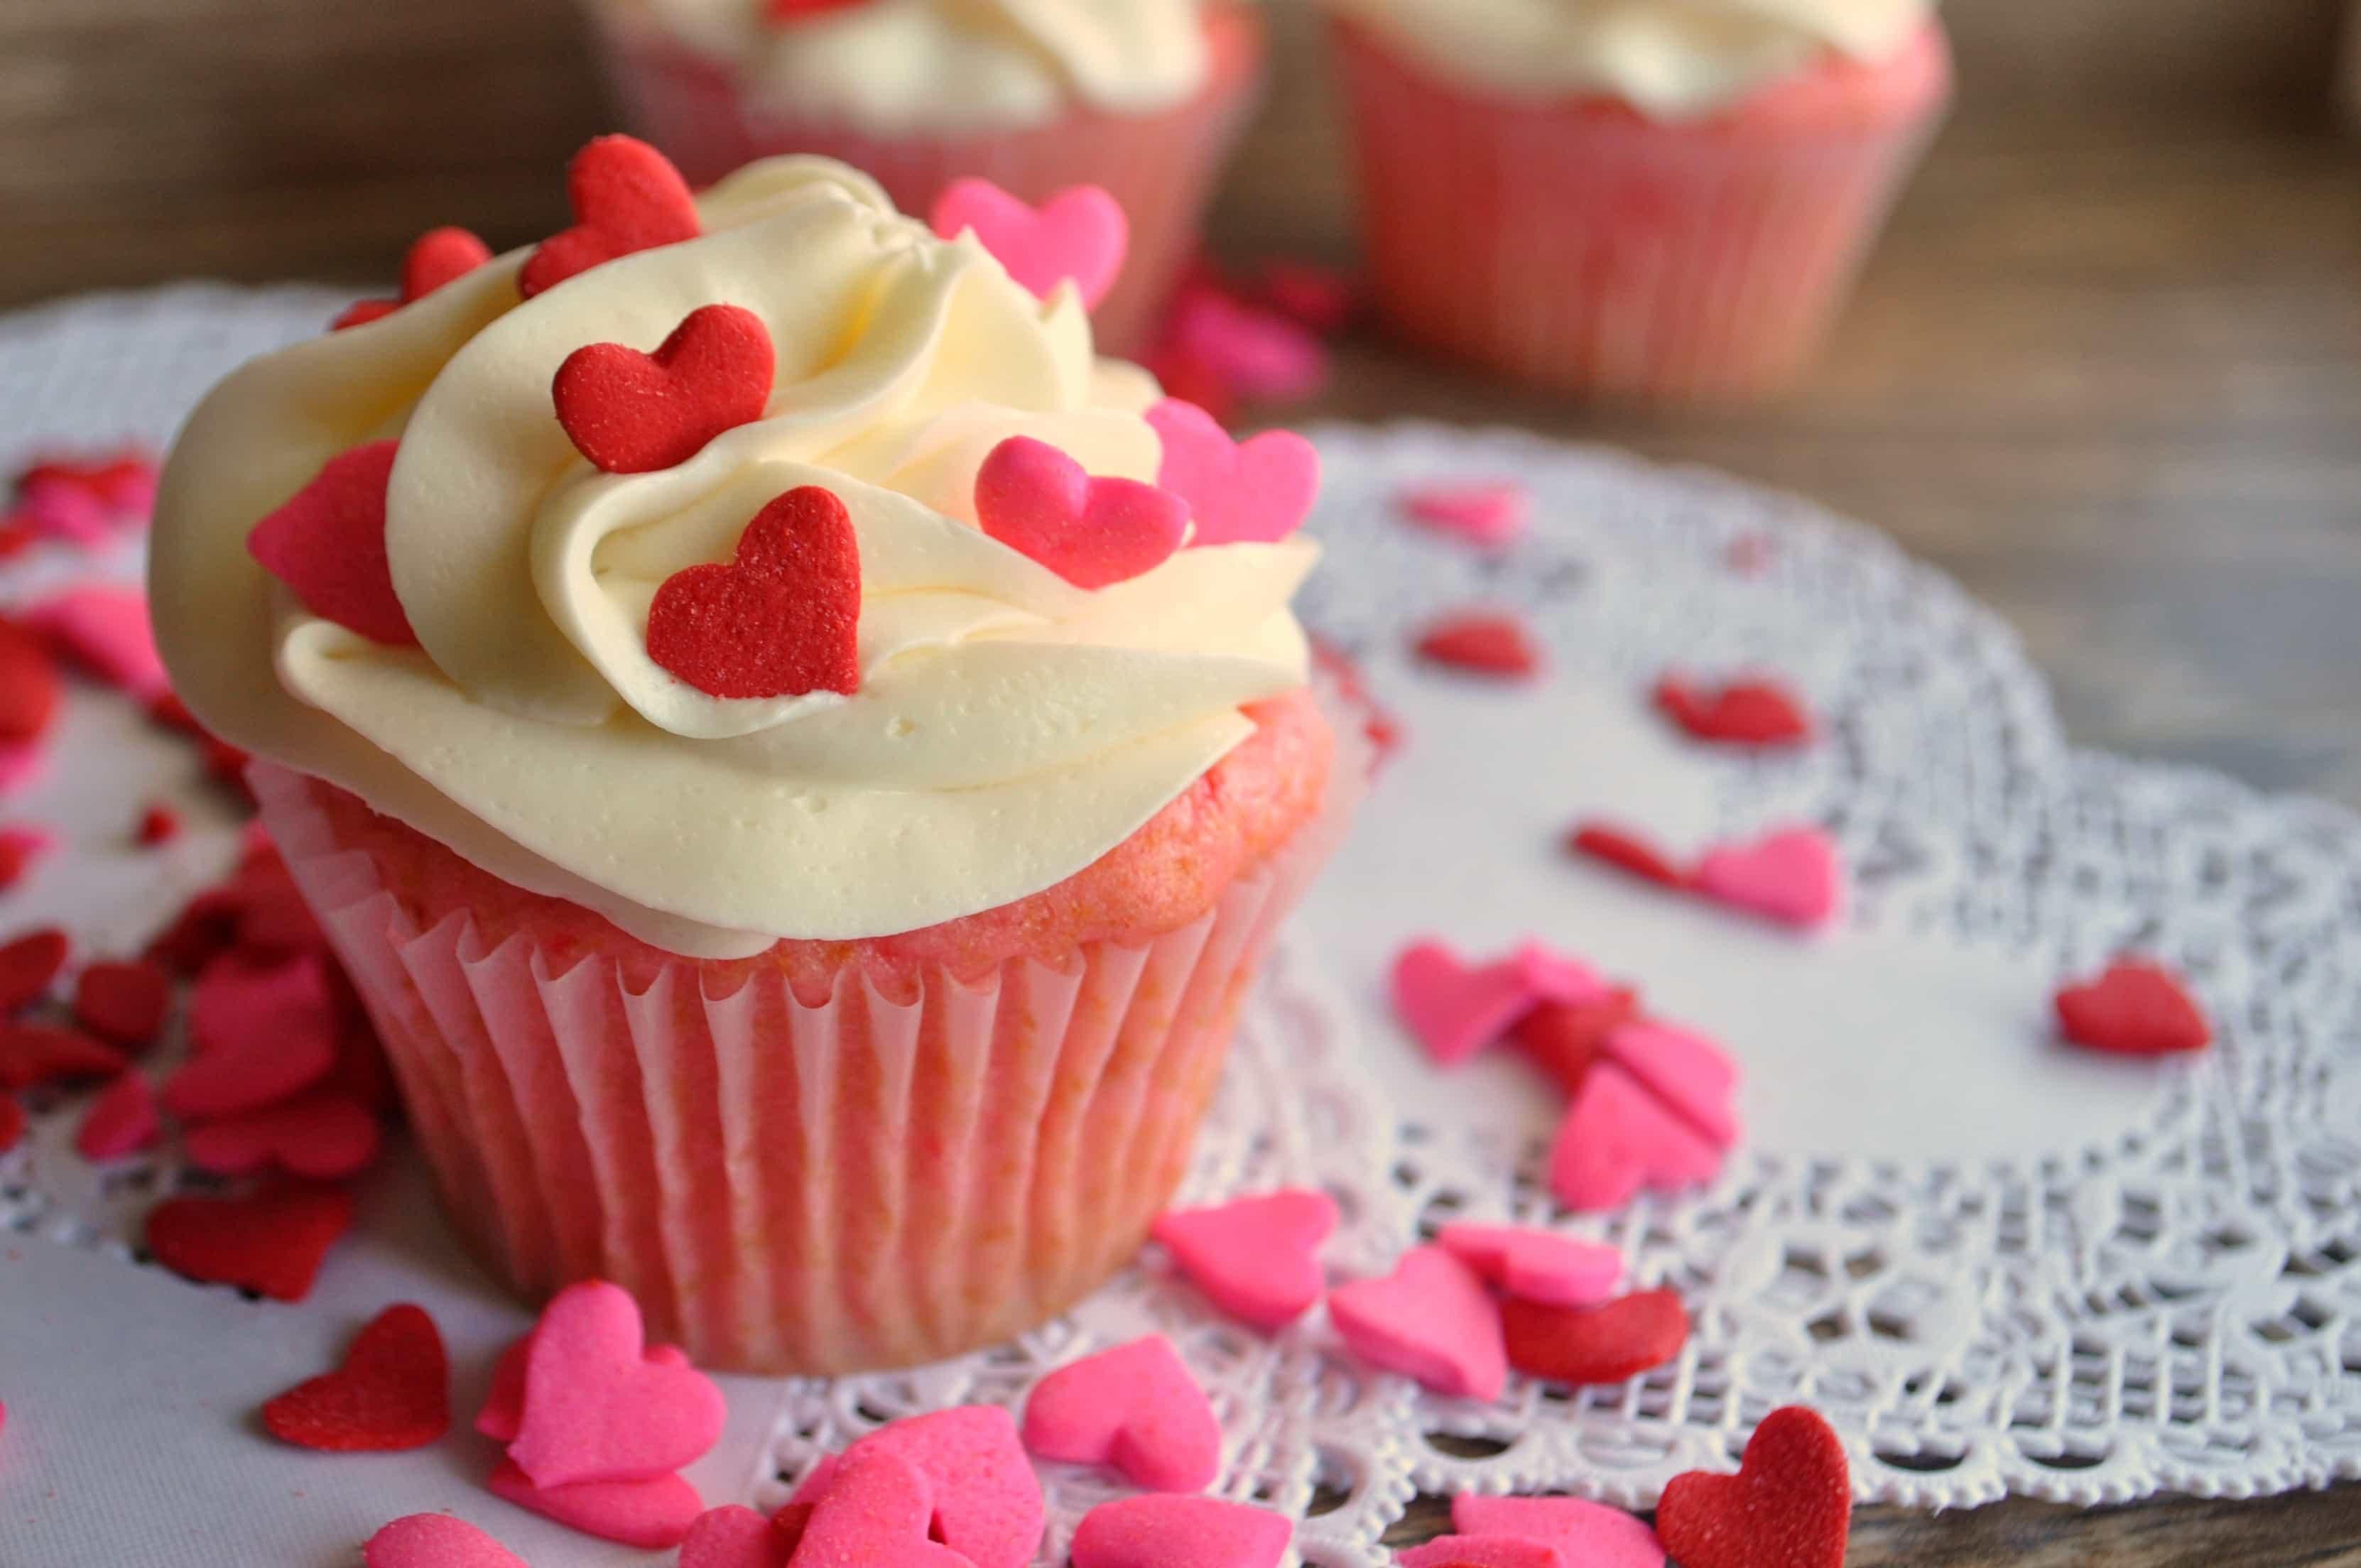 Valentine S Day Cupcake Decorating Ideas : Valentine s Day Cupcakes